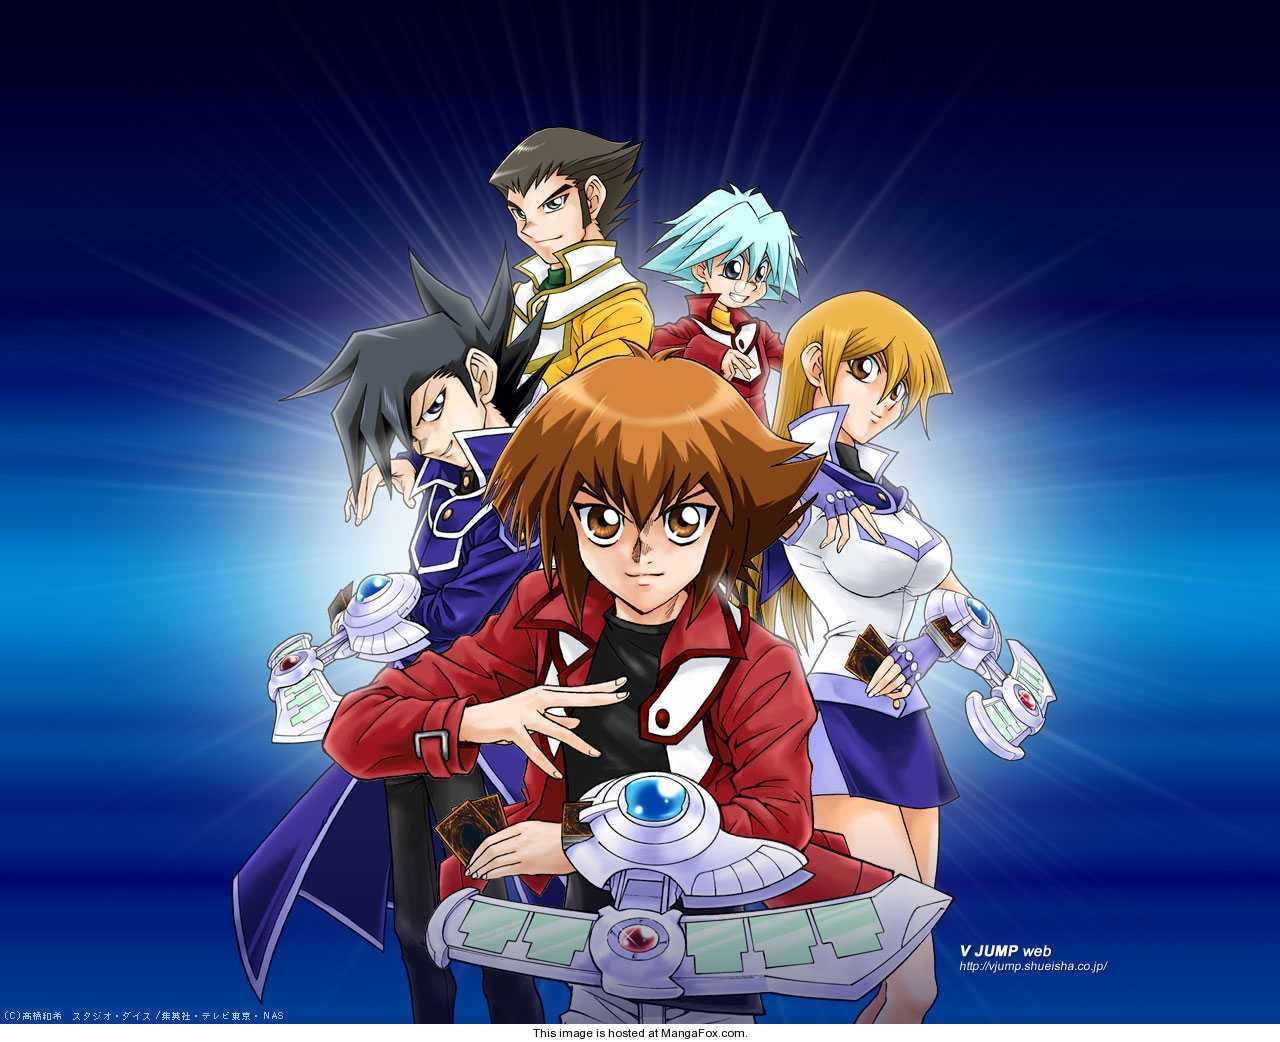 Ver Yu-Gi-Oh! GX Online